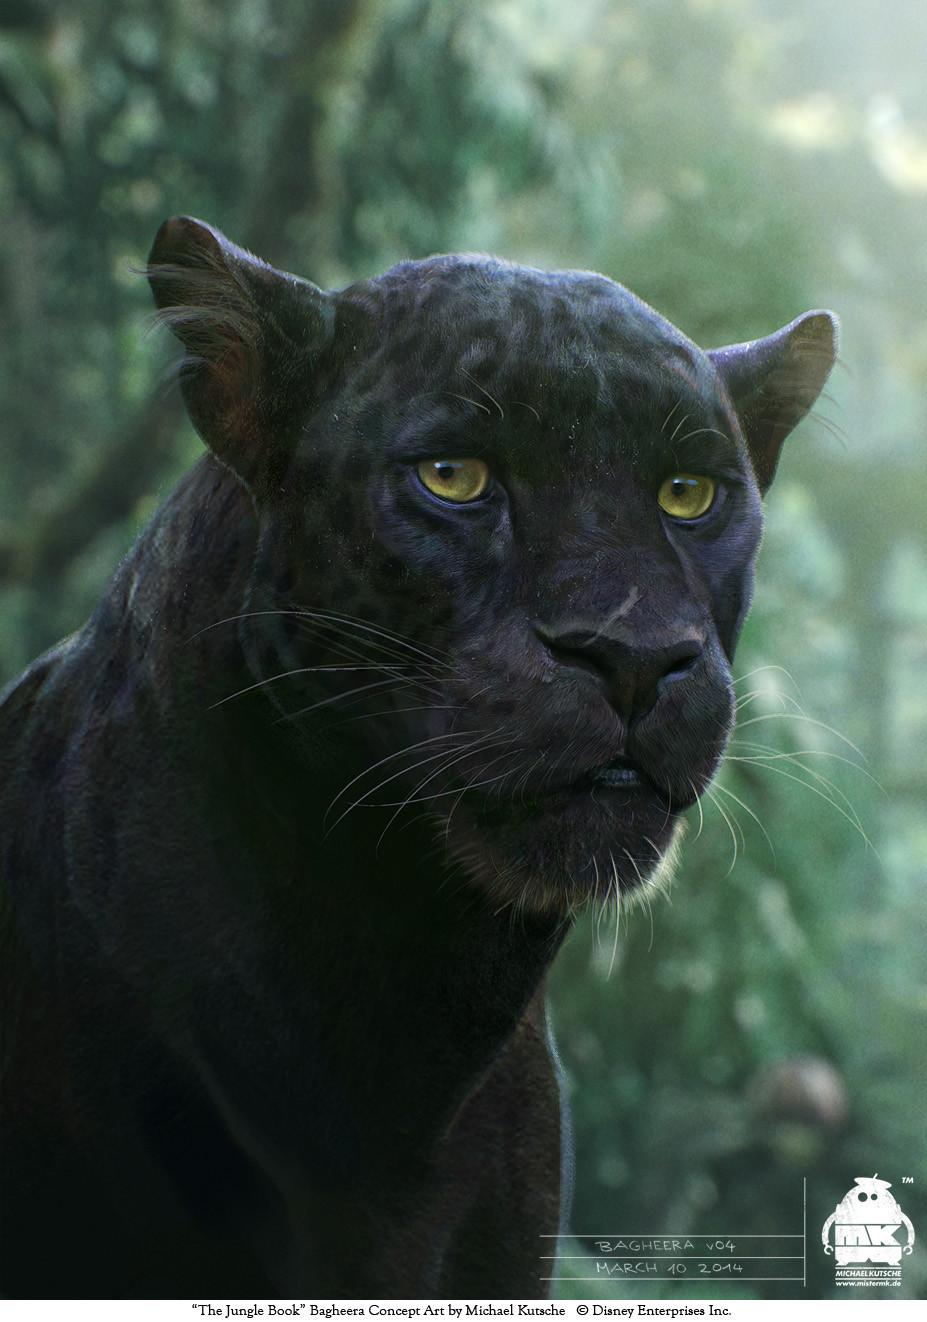 Le Livre de la Jungle [Disney - 2016] - Page 15 Michael-kutsche-bagheera-v04-by-michael-kutsche